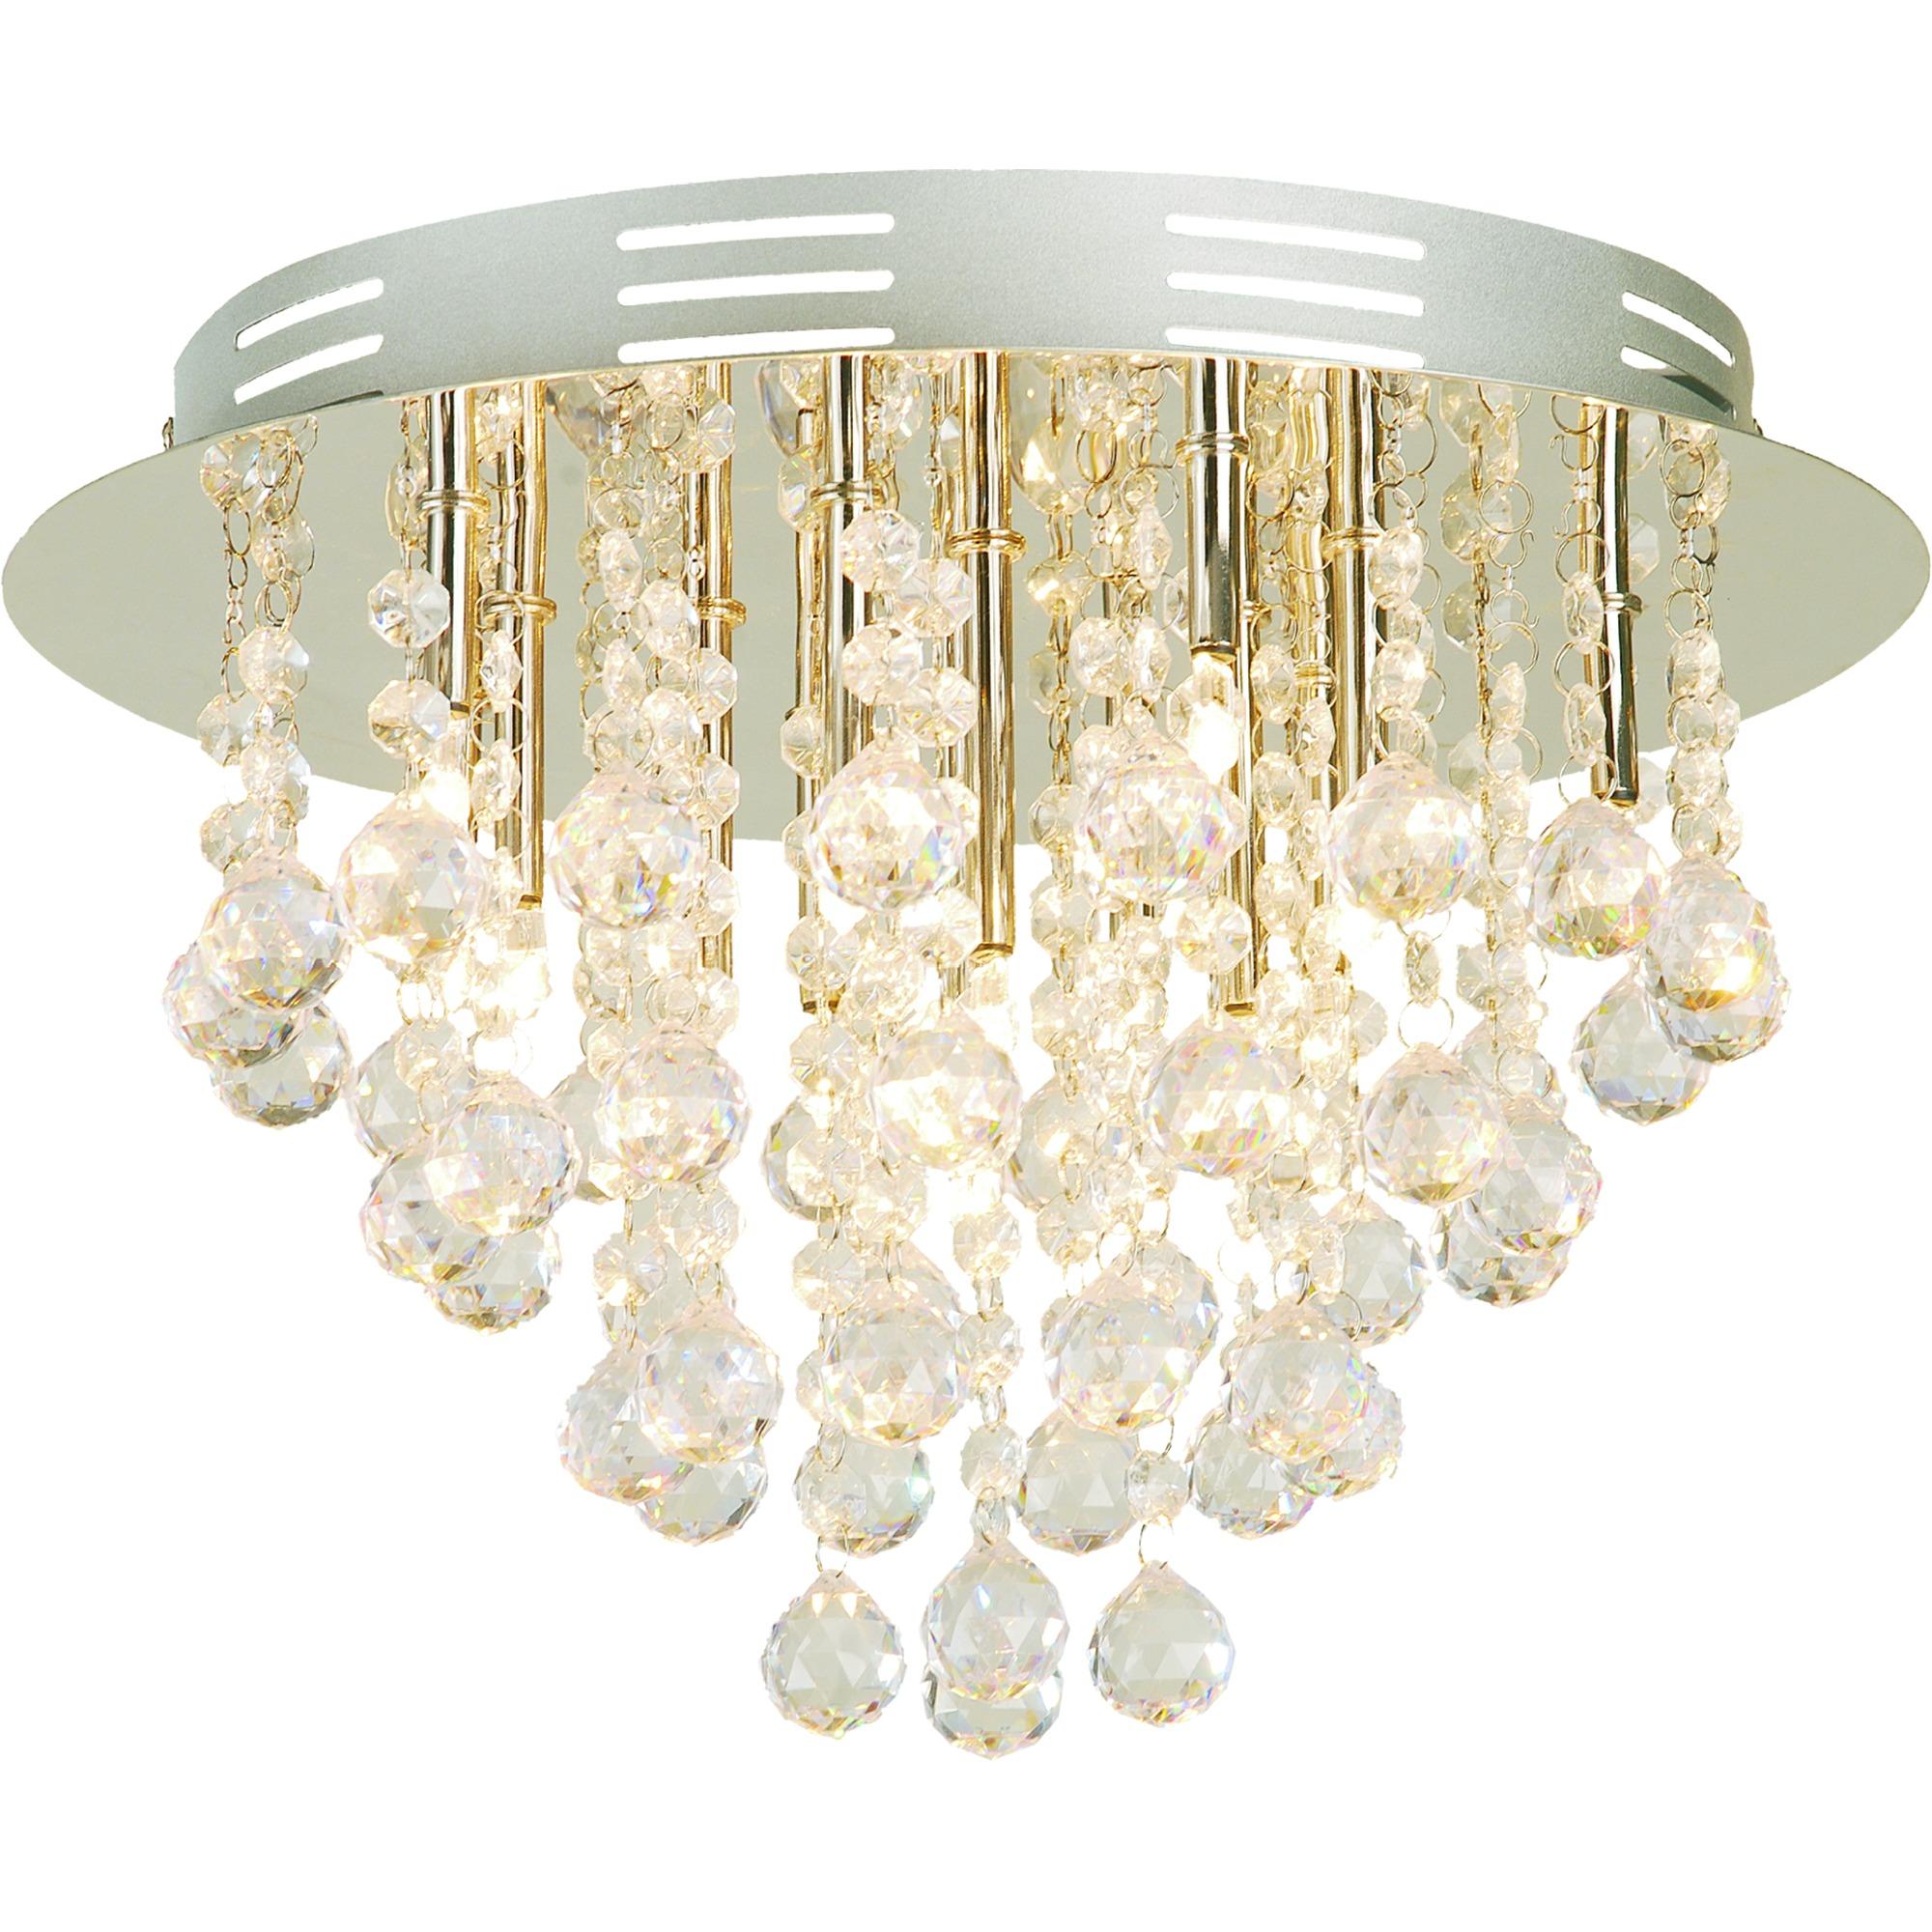 KARWEI plafondlamp Global  Huis  Ceiling Lights